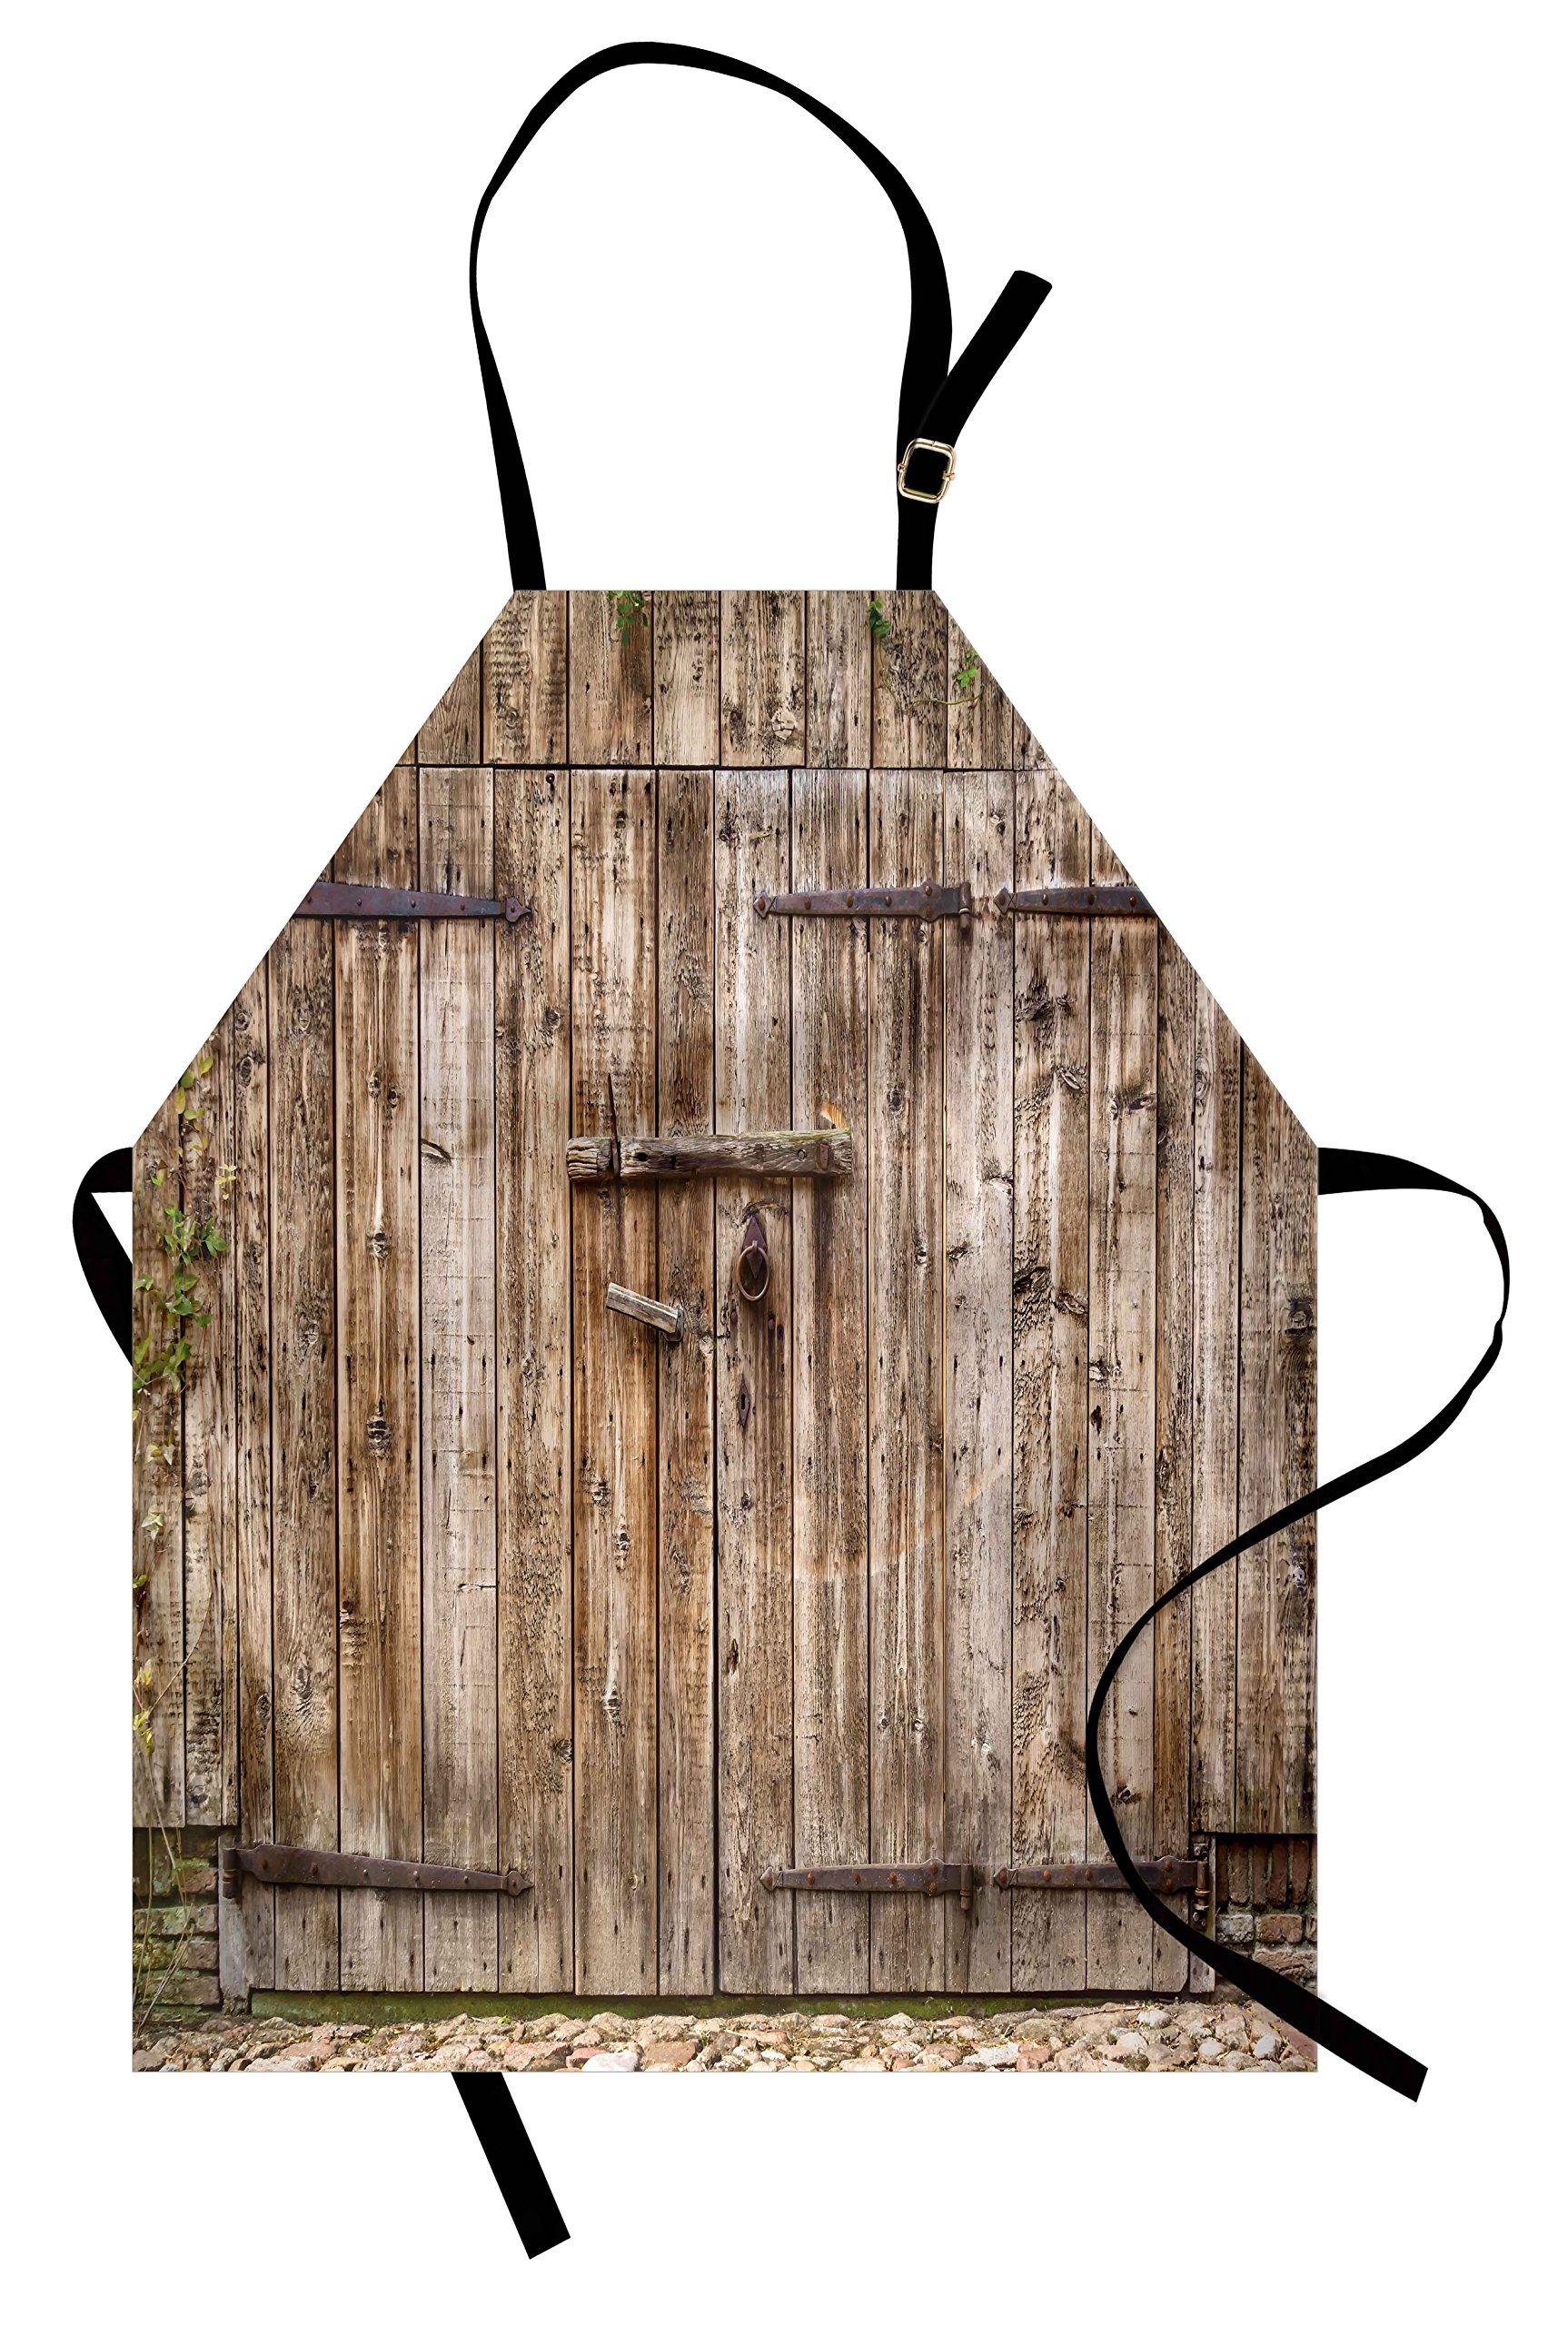 Ambesonne Rustic Apron, Old Oak Closed Garage Door with Steel Hinges Vintage Typical Cottage Doorway Image, Unisex Kitchen Bib Apron with Adjustable Neck for Cooking Baking Gardening, Tortilla